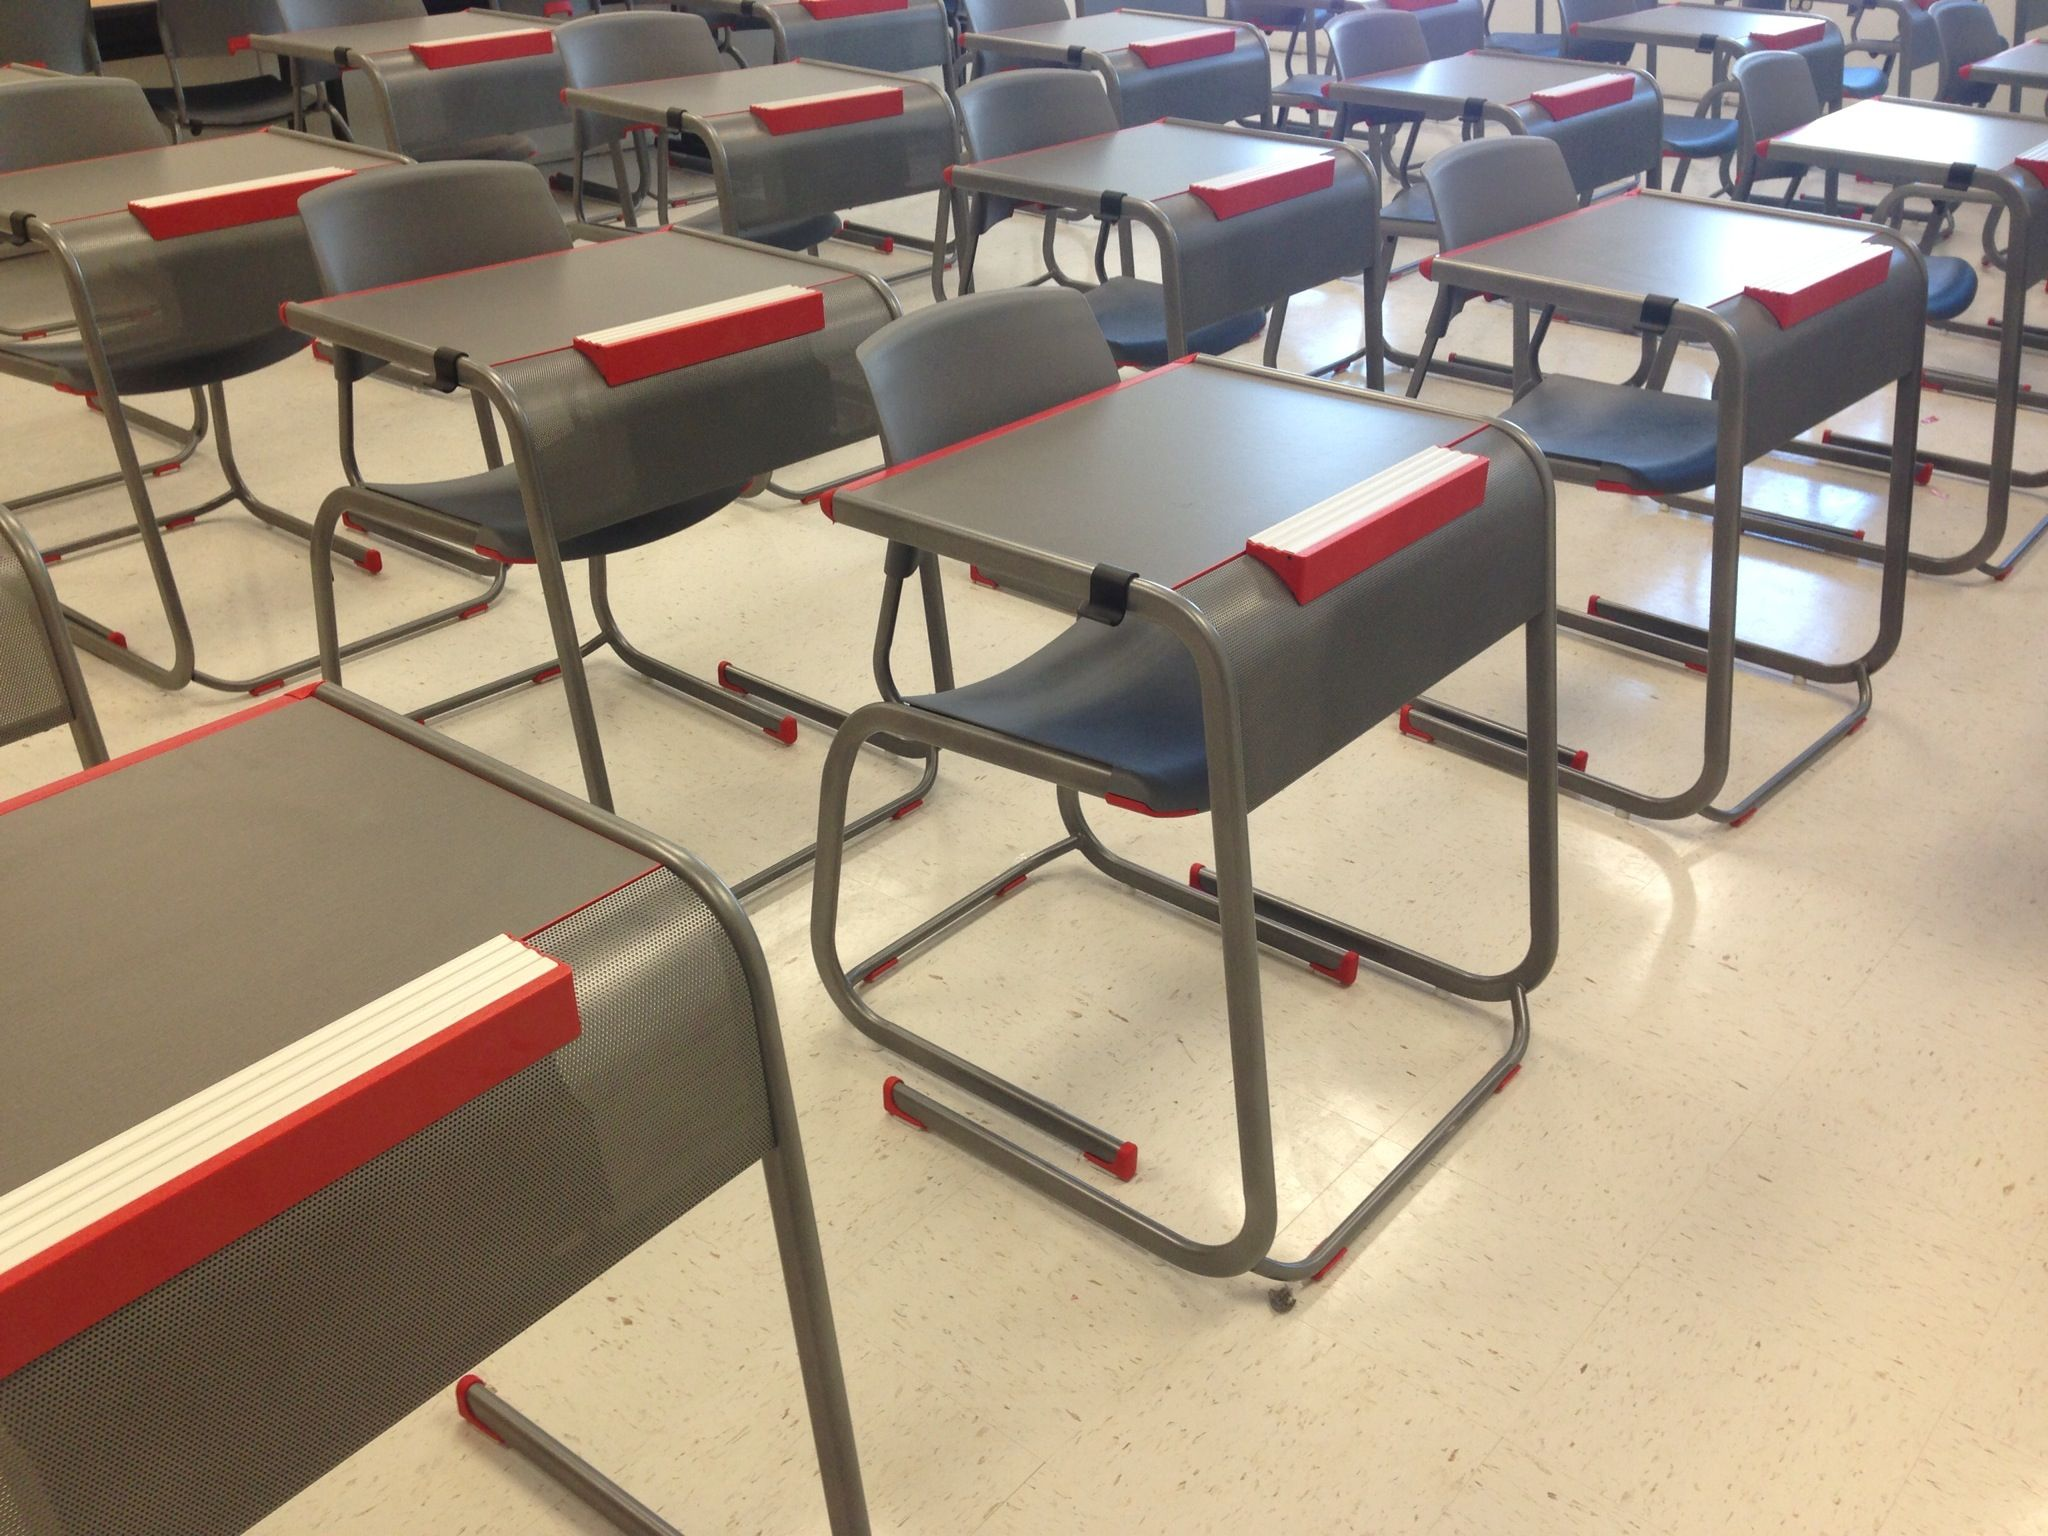 Aandd Install School Furniture For The 21stcenturyclassroom